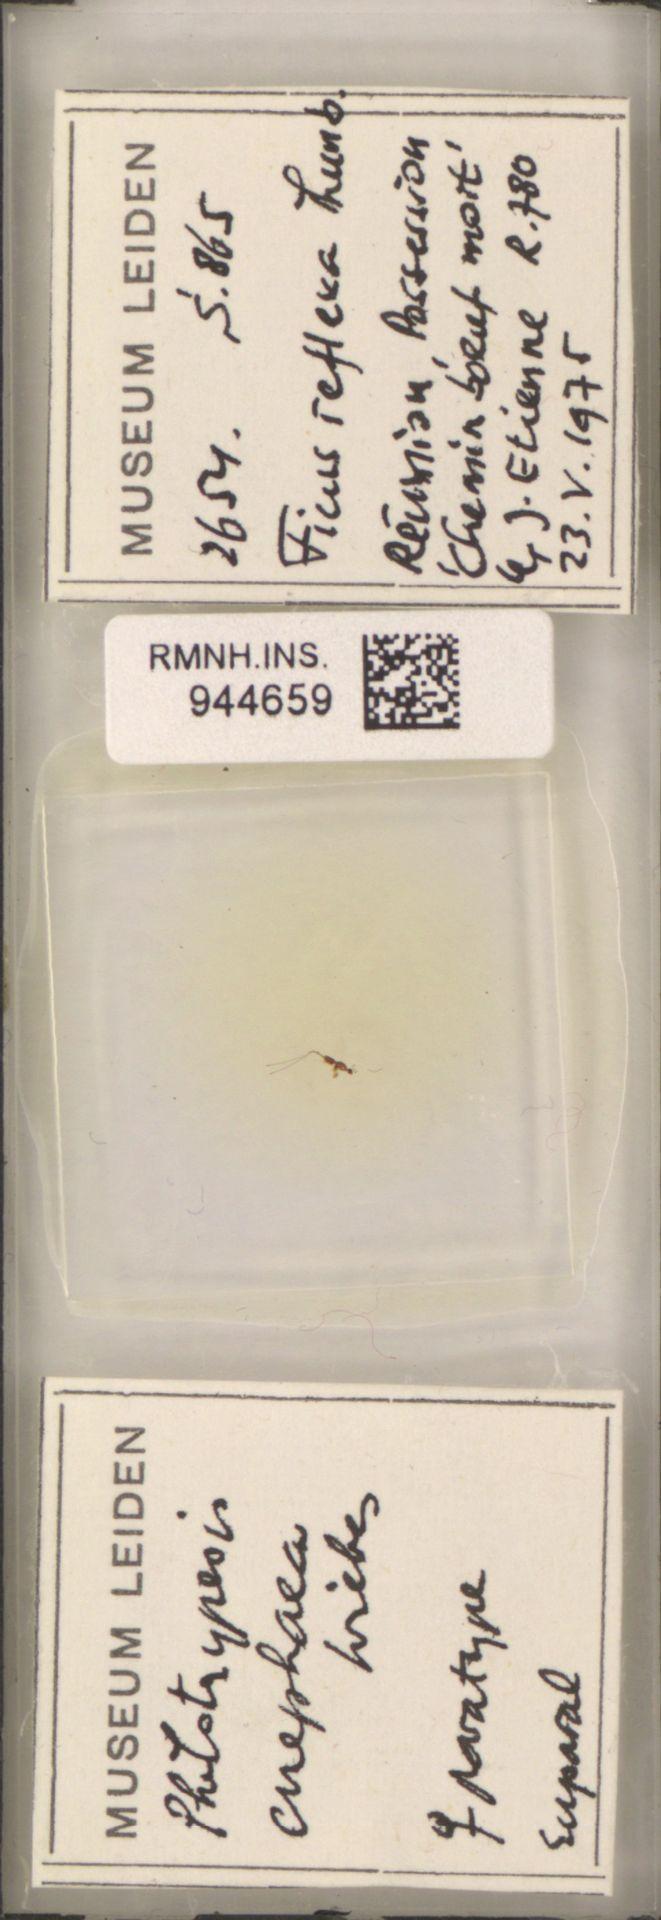 RMNH.INS.944659 | Philotrypesis enephaea Wiebes